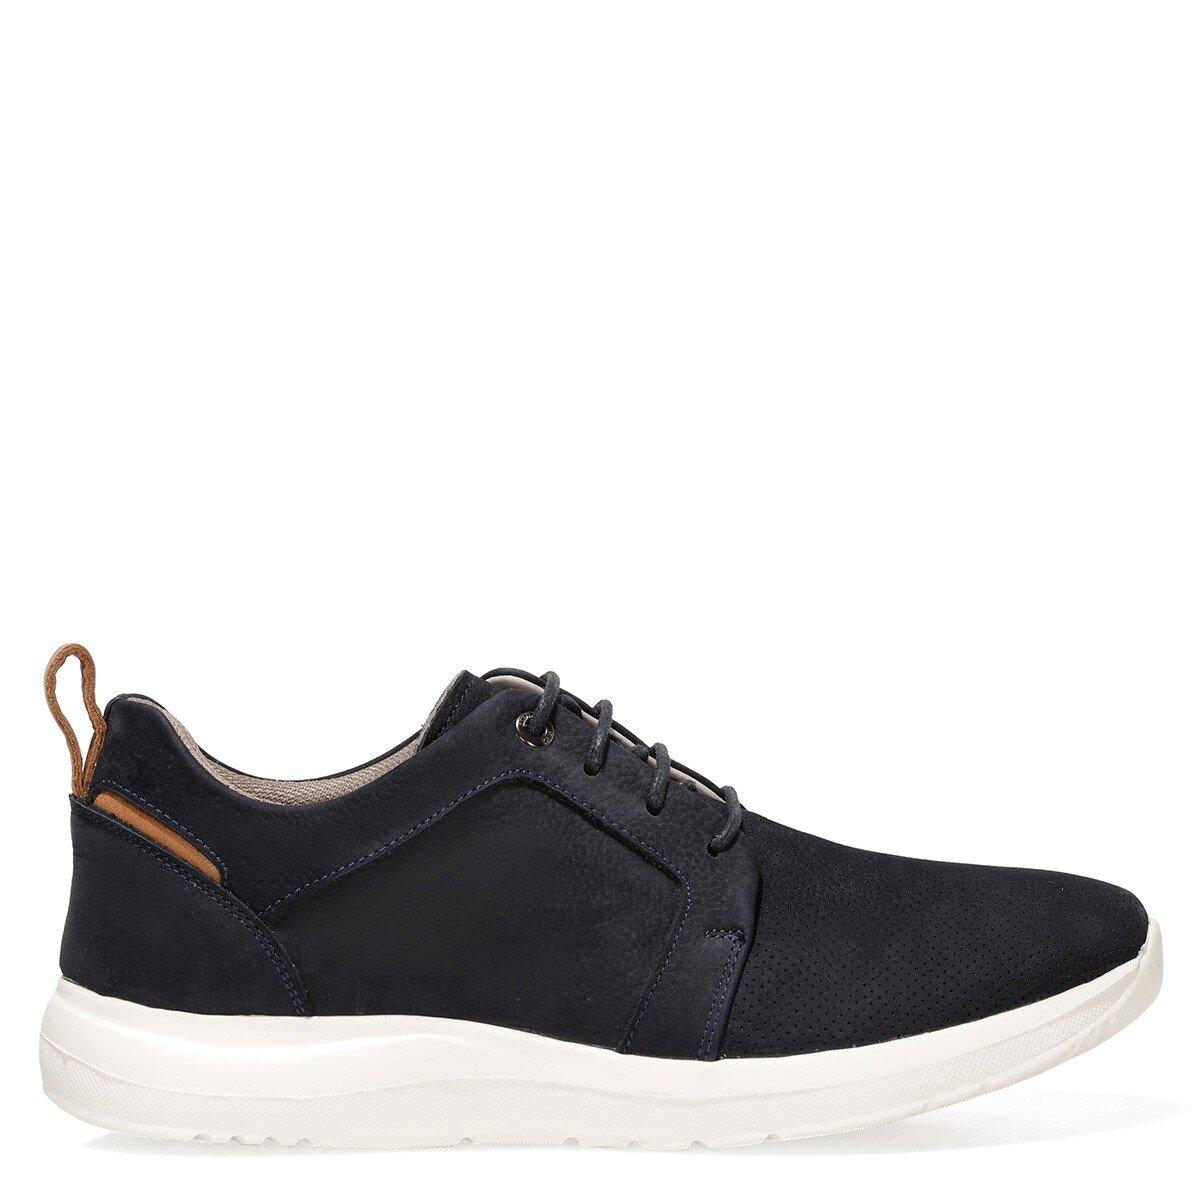 MURKA 1FX Lacivert Erkek Sneaker